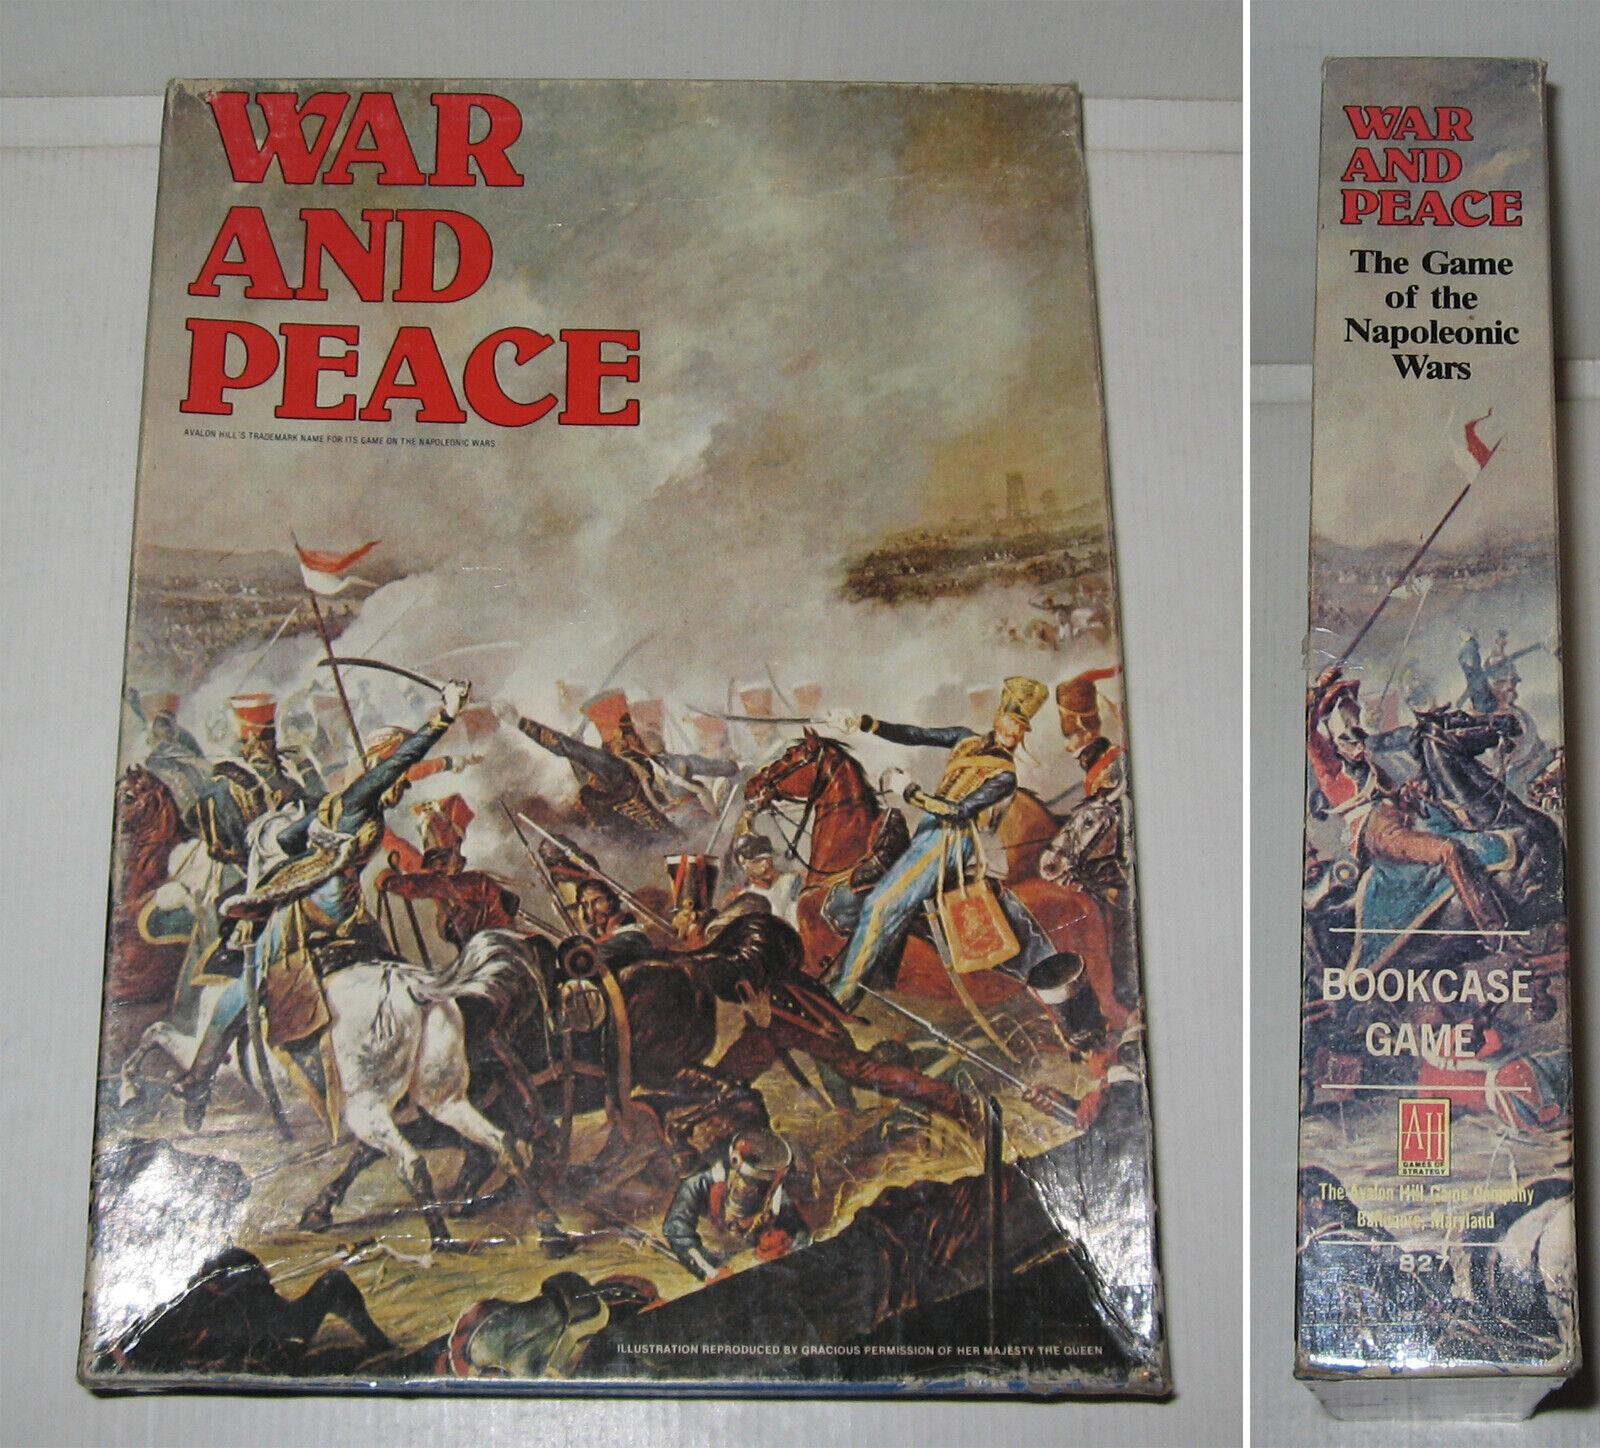 JEU,WAR & PEACE,AVALON HILL 1980,TBE,VGC,WARGAME,NAPOLEON,UNPUNCHED COUNTERS